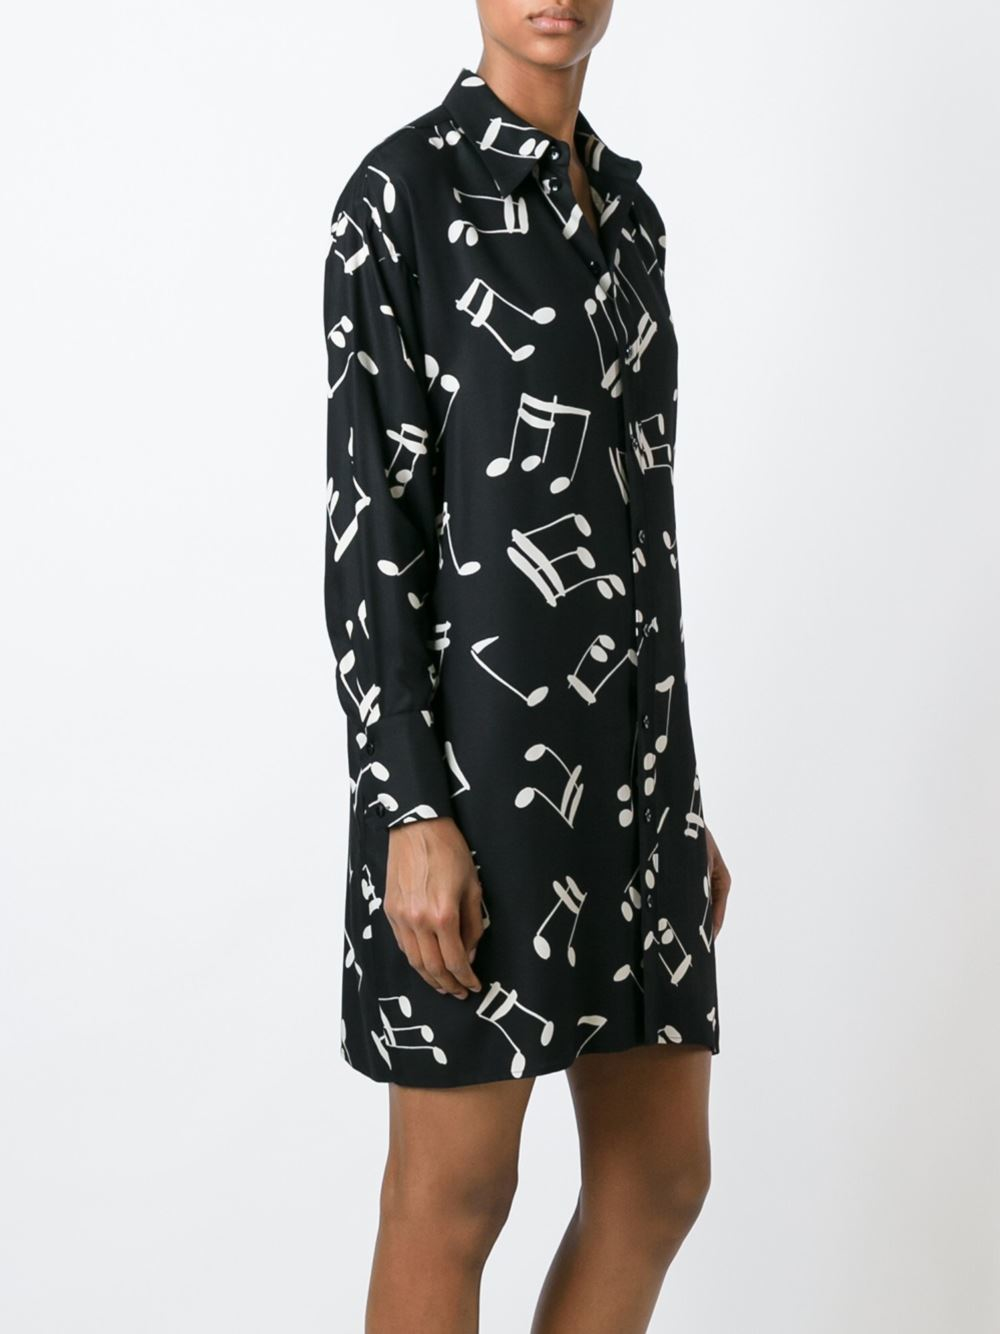 Saint laurent music note printed shirt dress in black lyst for Saint laurent shirt womens